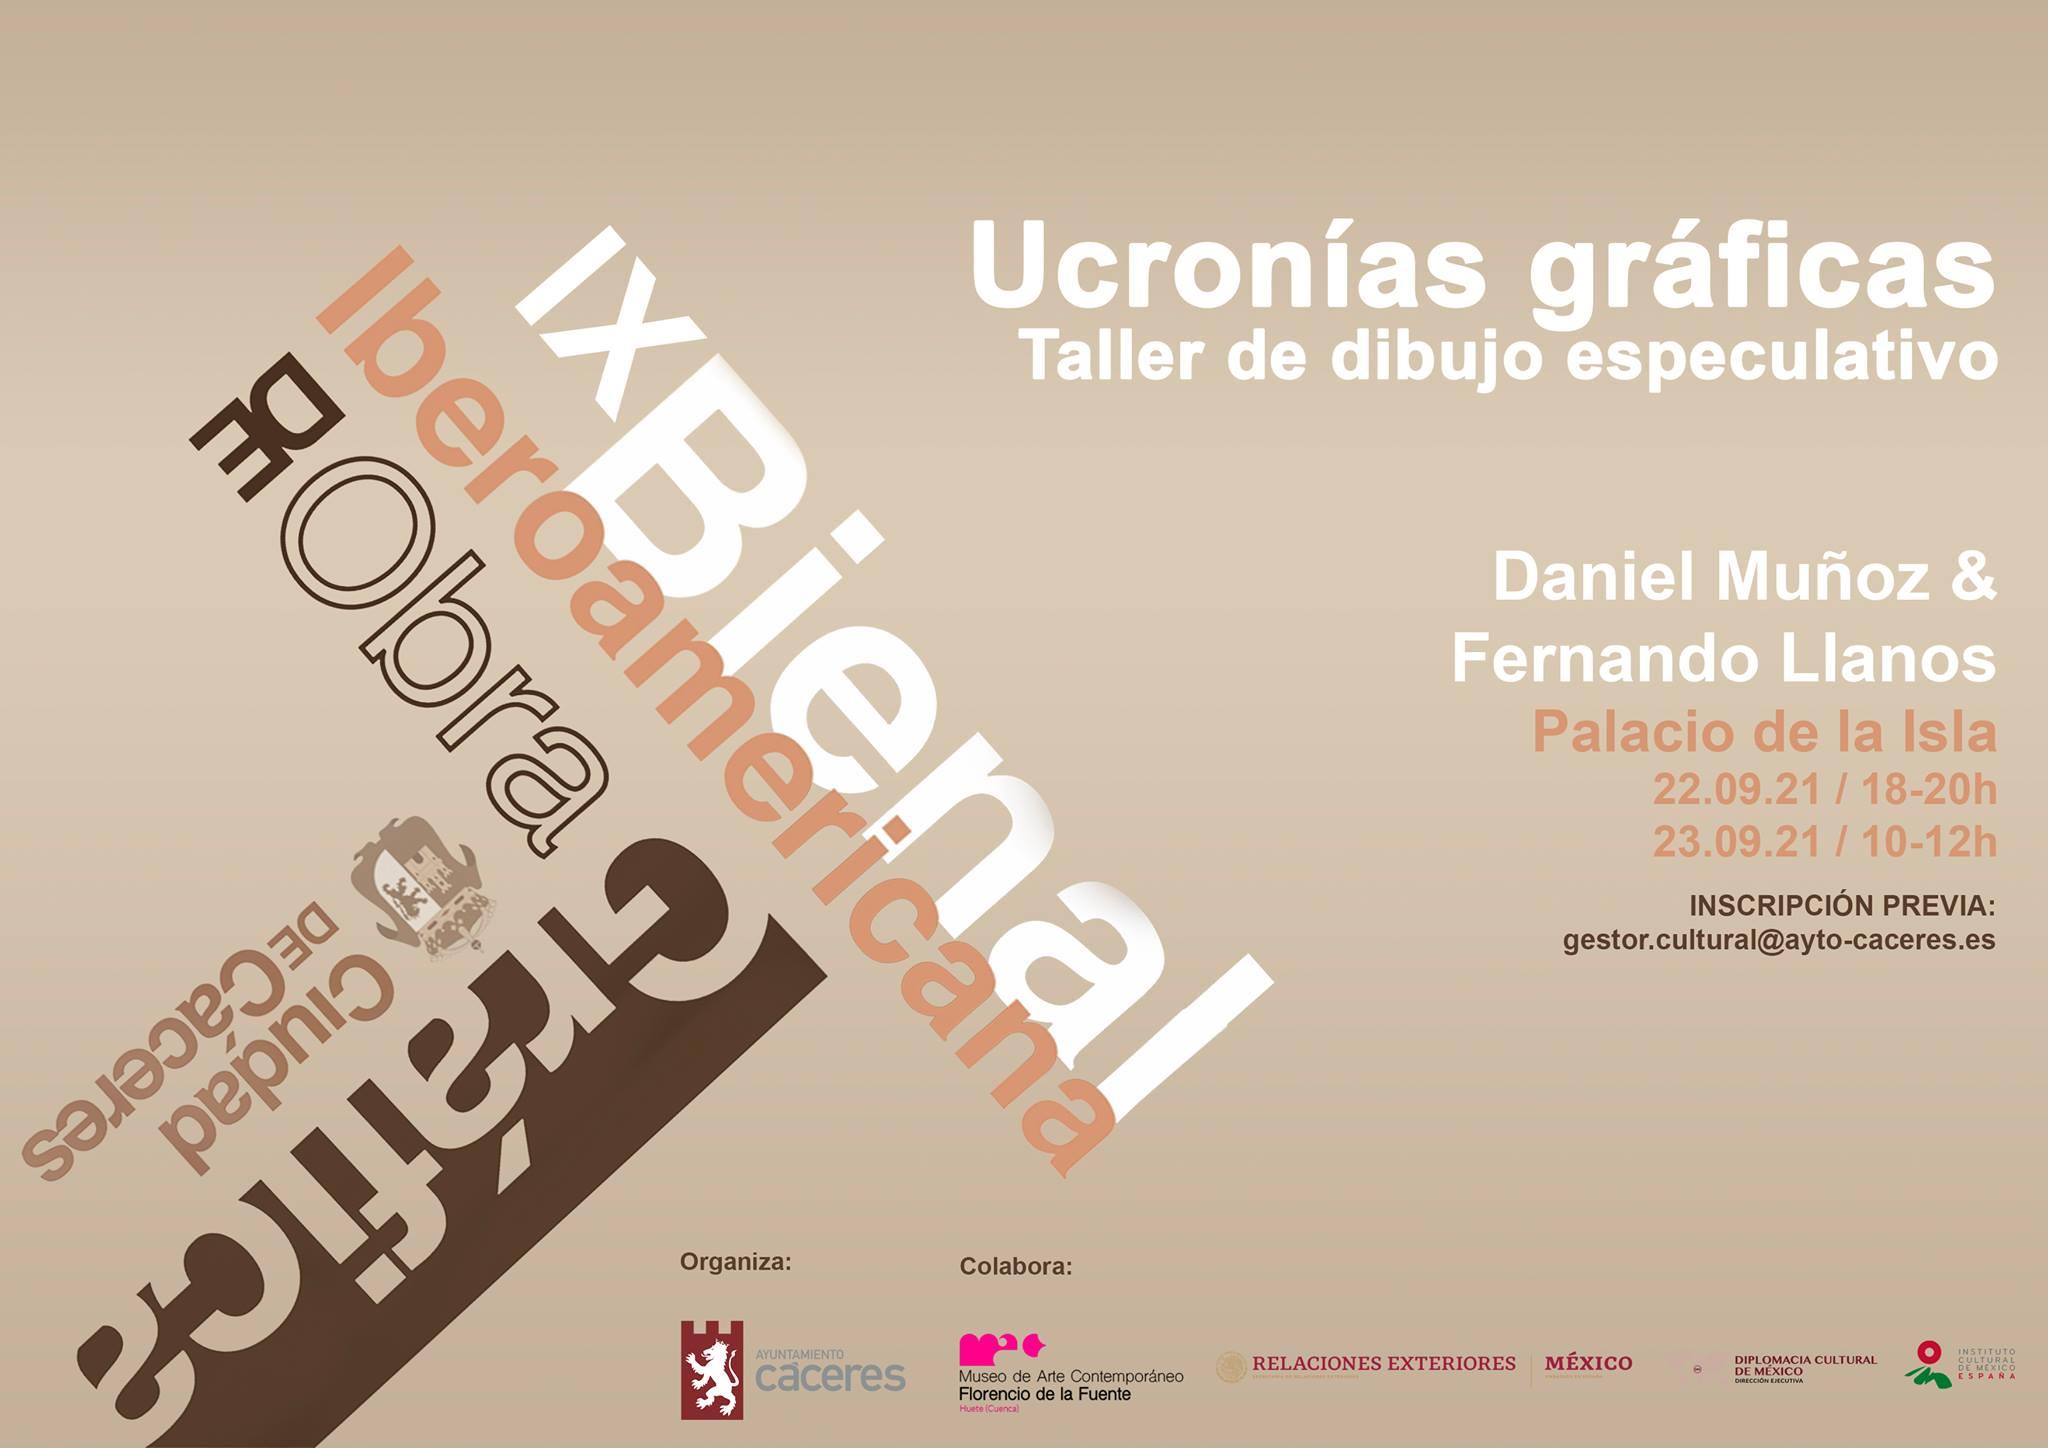 Taller: Ucronías gráficas. Daniel Muñoz & Fernando Llanos